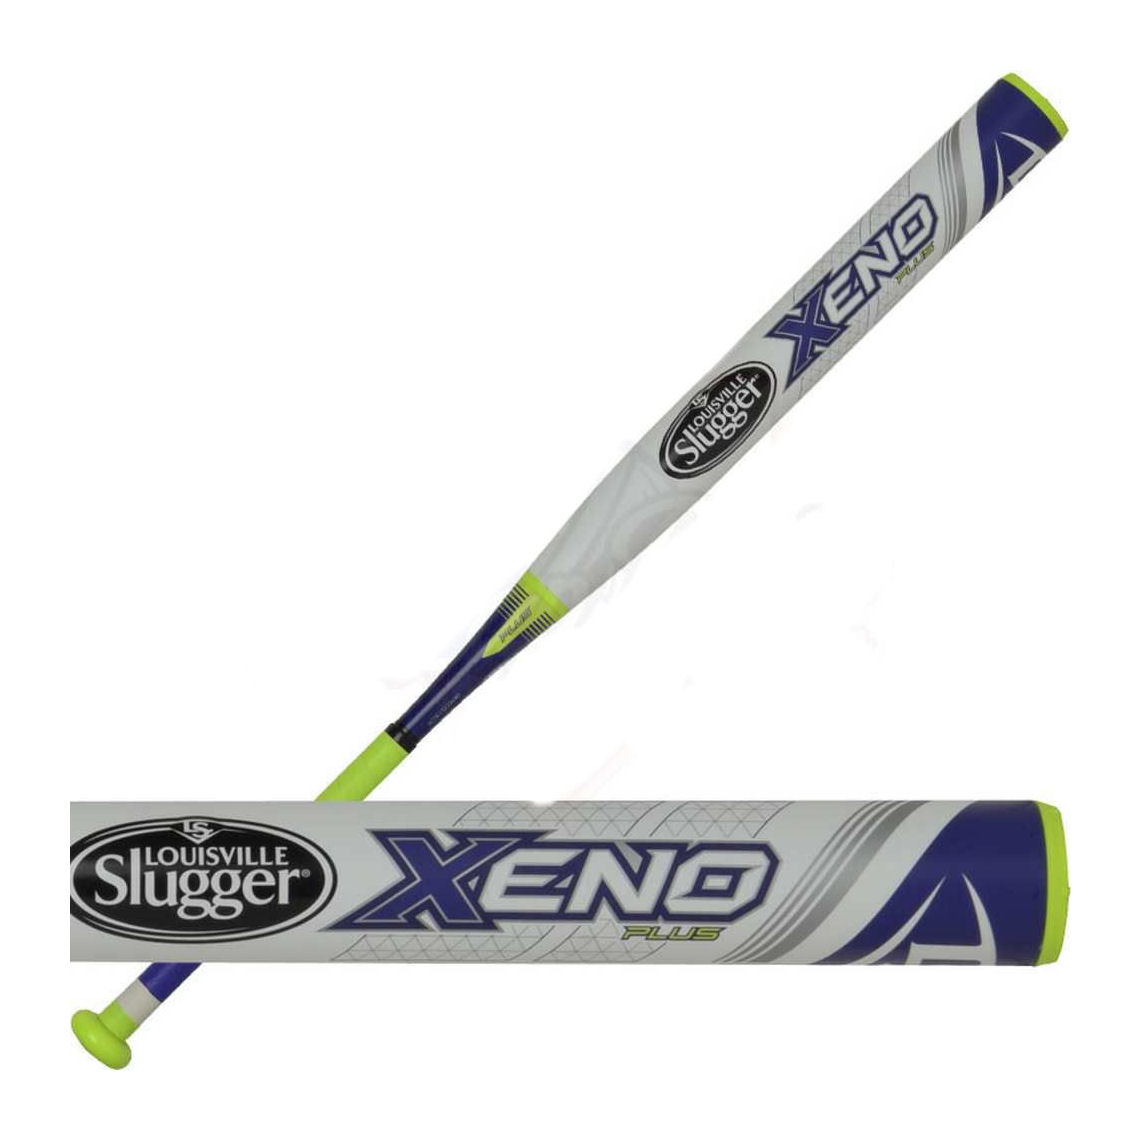 2016 Louisville Slugger Xeno Plus Fastpitch Softball Bat ...